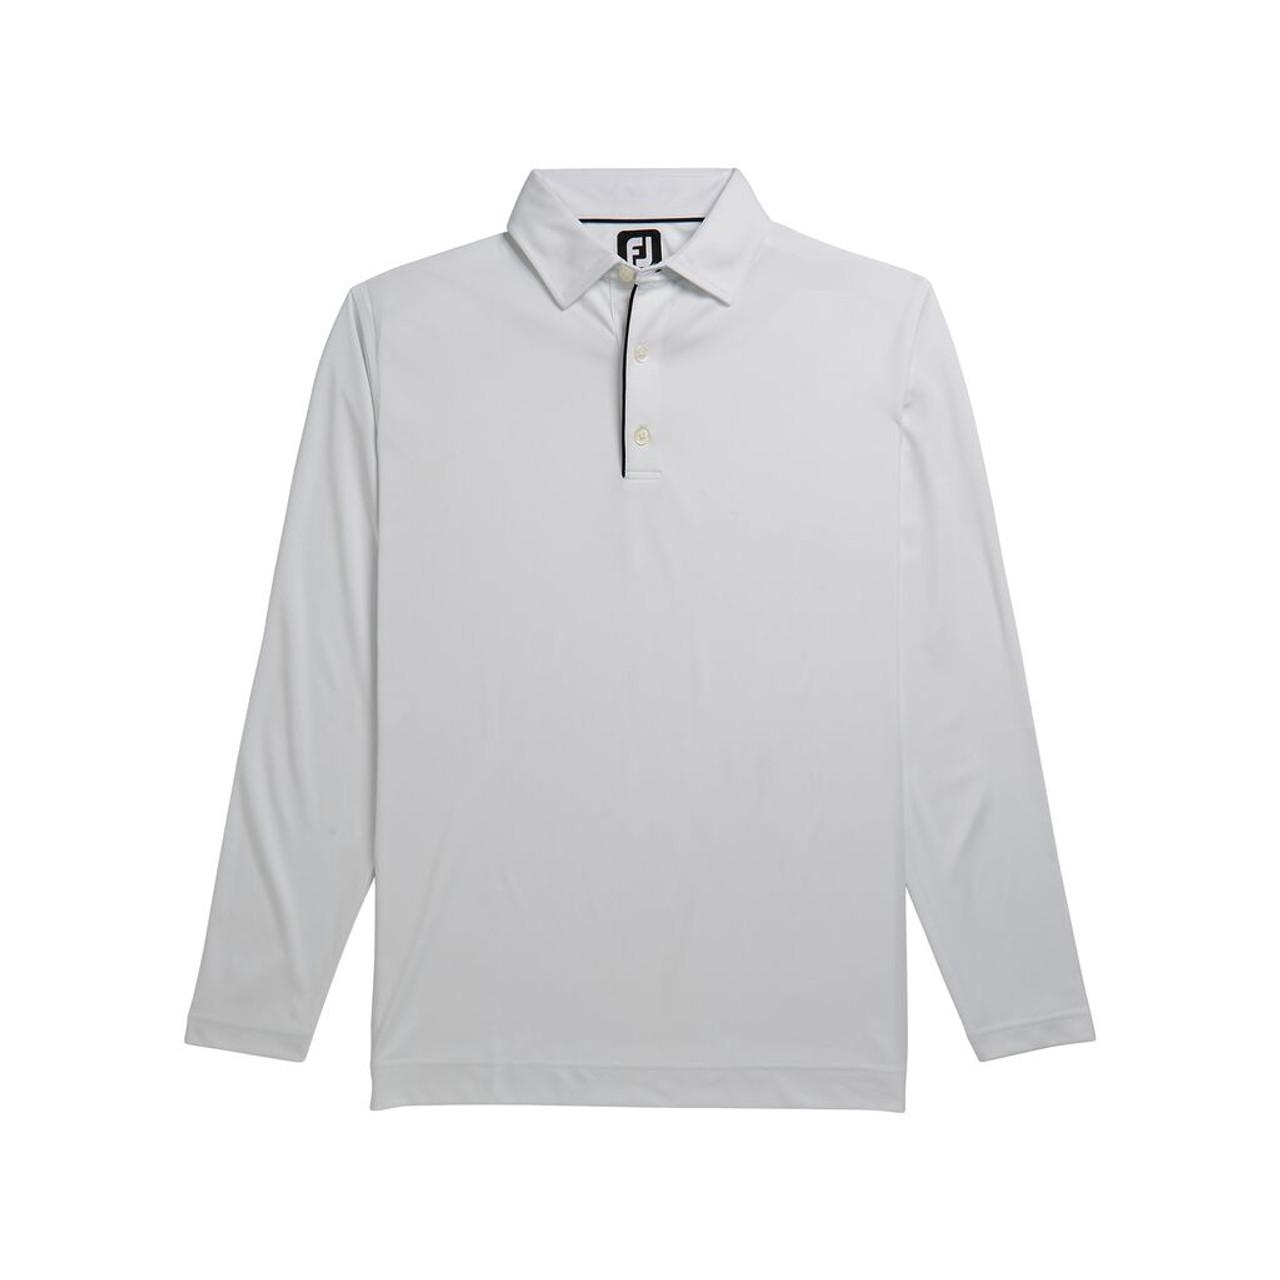 FootJoy Long Sleeve Sun Protection Shirt - White (26233)